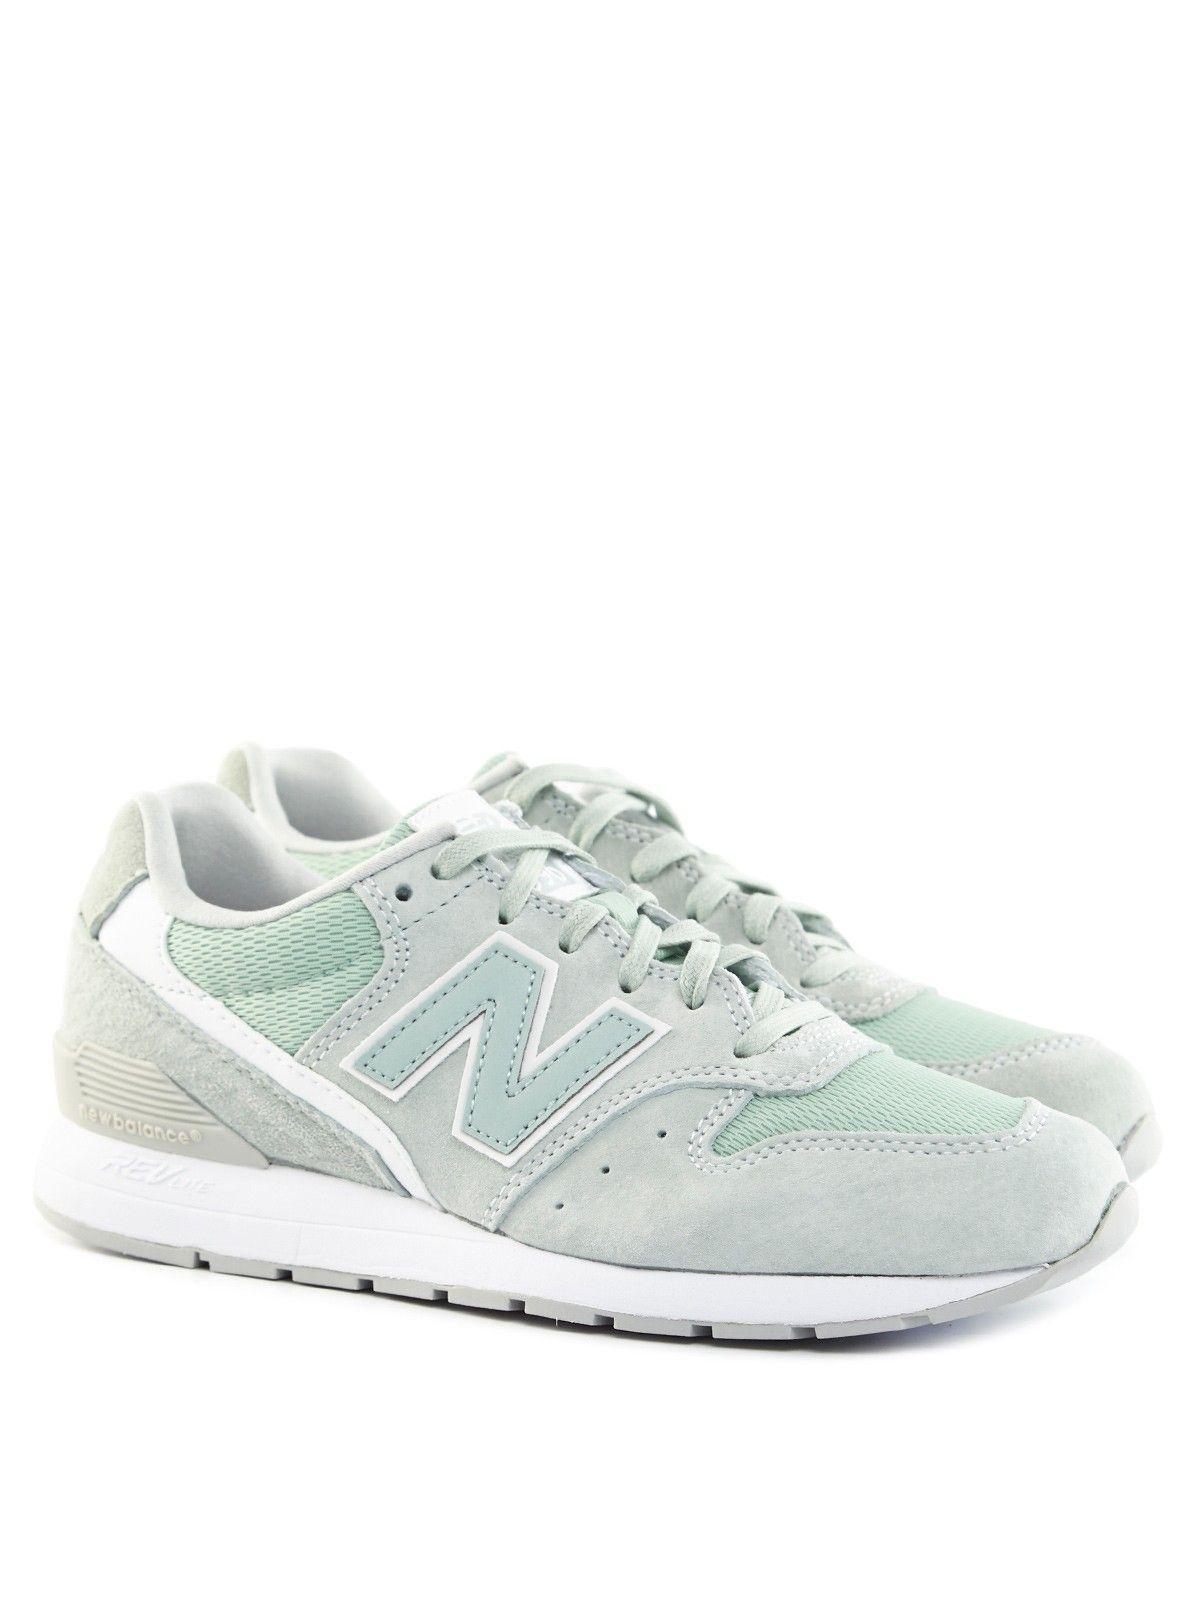 NEW BALANCE MRL996LH Damen Sneaker Grün online kaufen